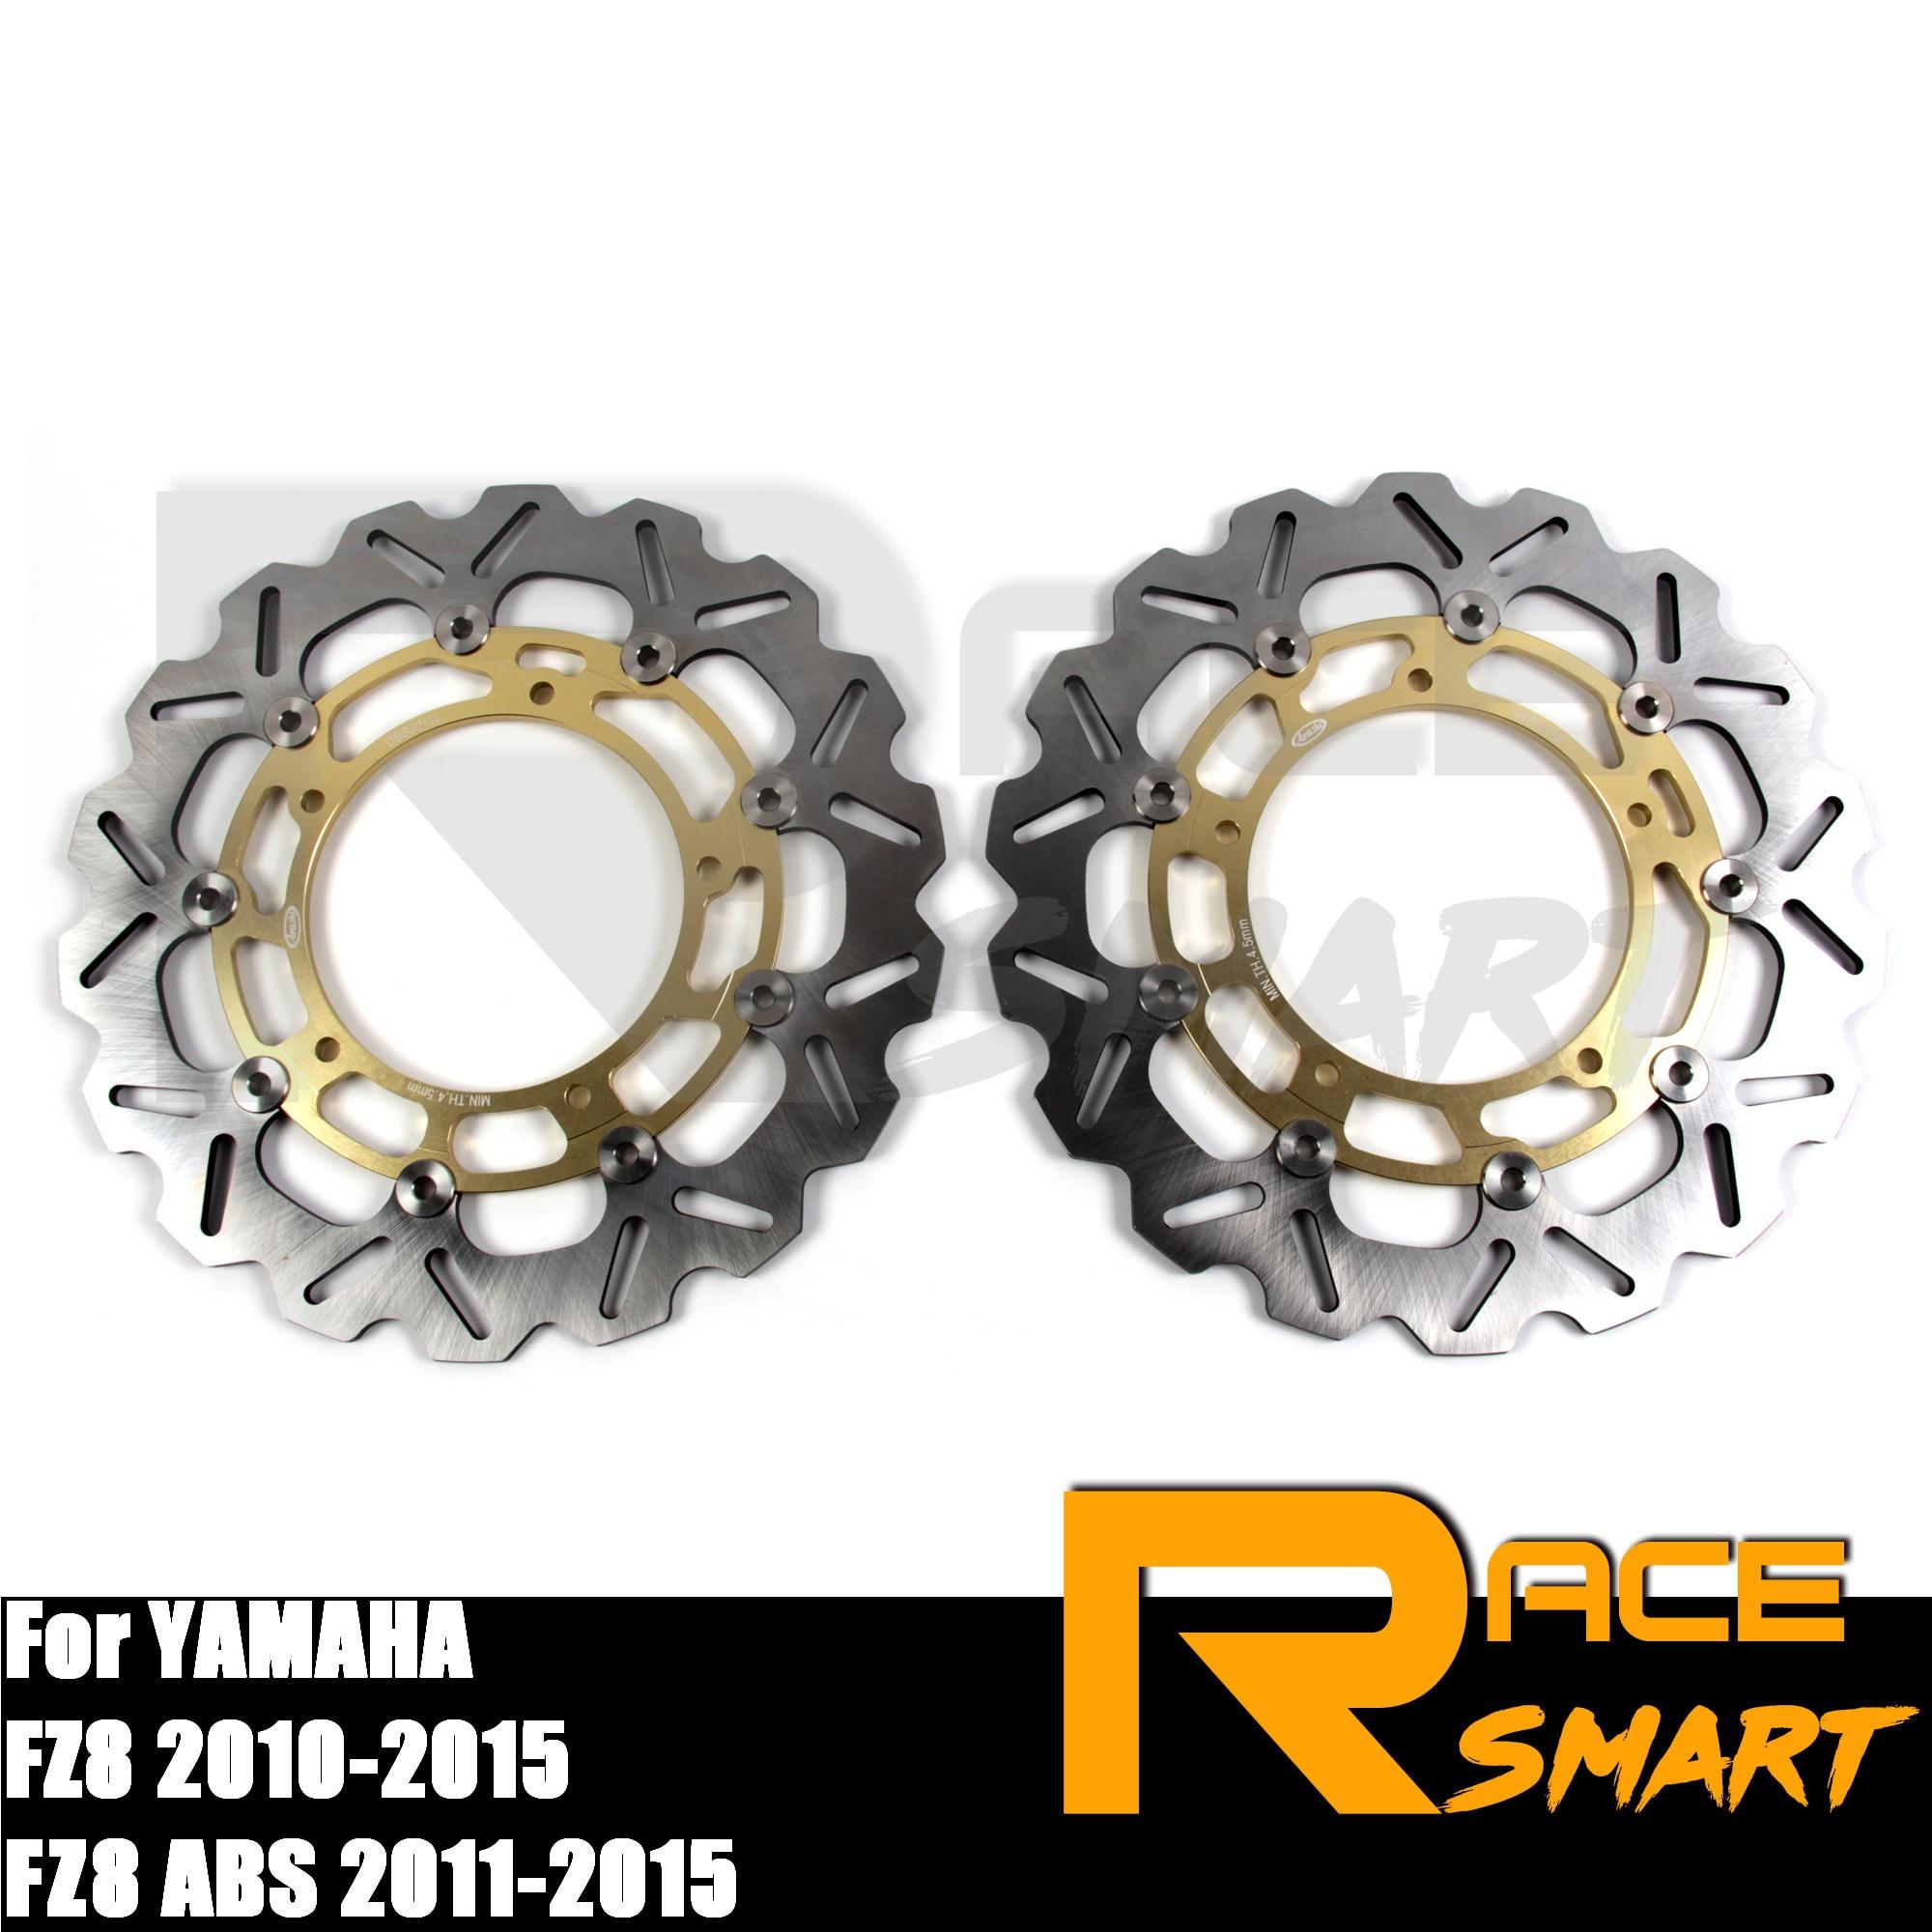 Rotores de disco de freno delantero flotante CNC para motocicleta para YAMAHA FZ8 2010-2015, discos de freno FZ 8 ABS FZ-8 800 2011-2014 2012 2013 dorado